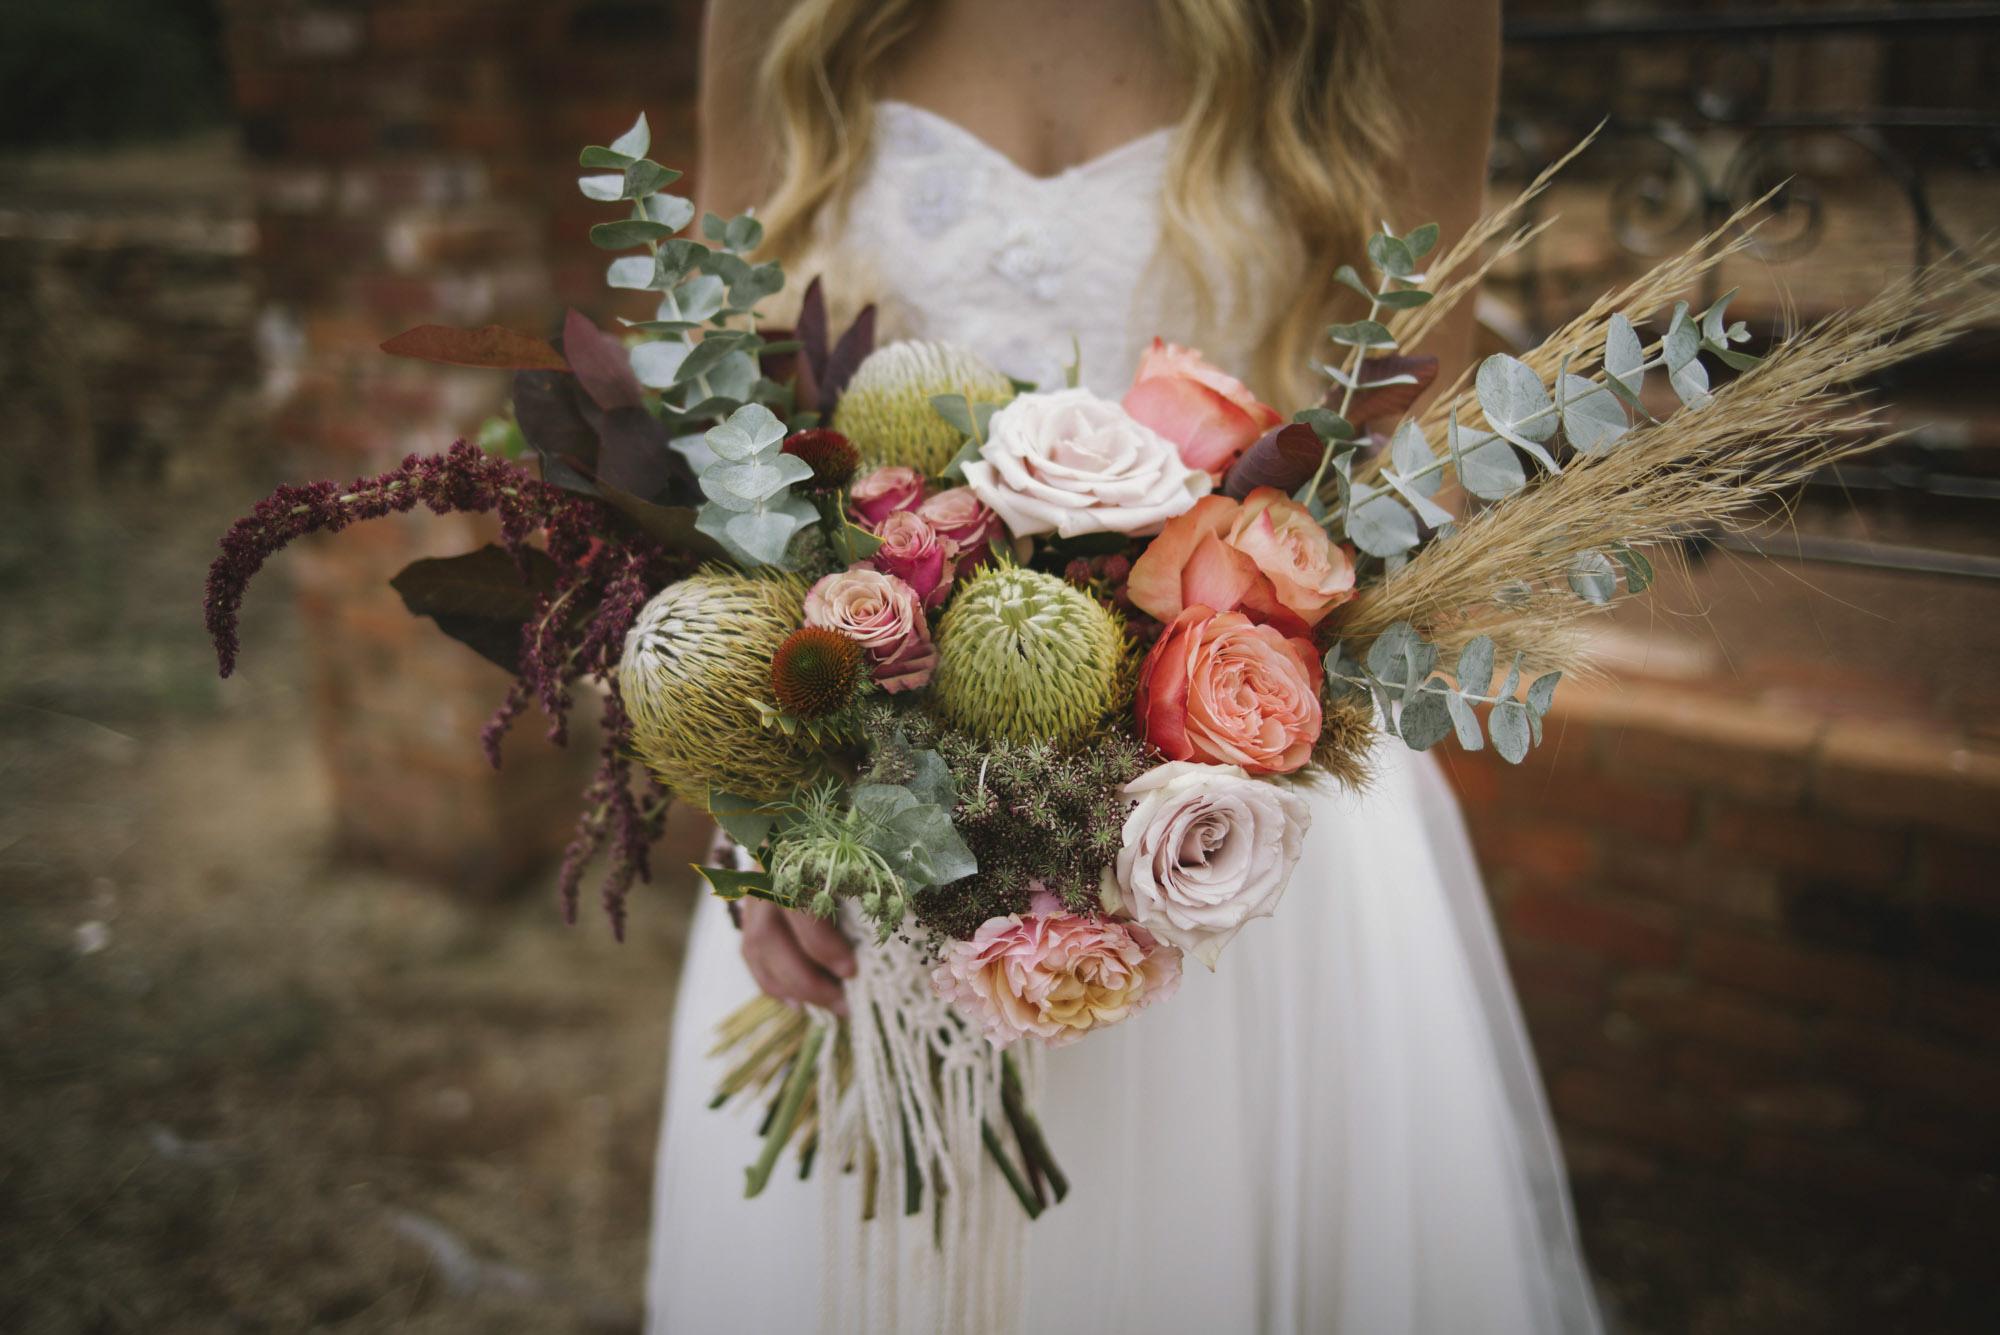 Angie-Roe-Photography-Wedding-Perth-Northam-Wheatbelt-Country-Rural (61).jpg